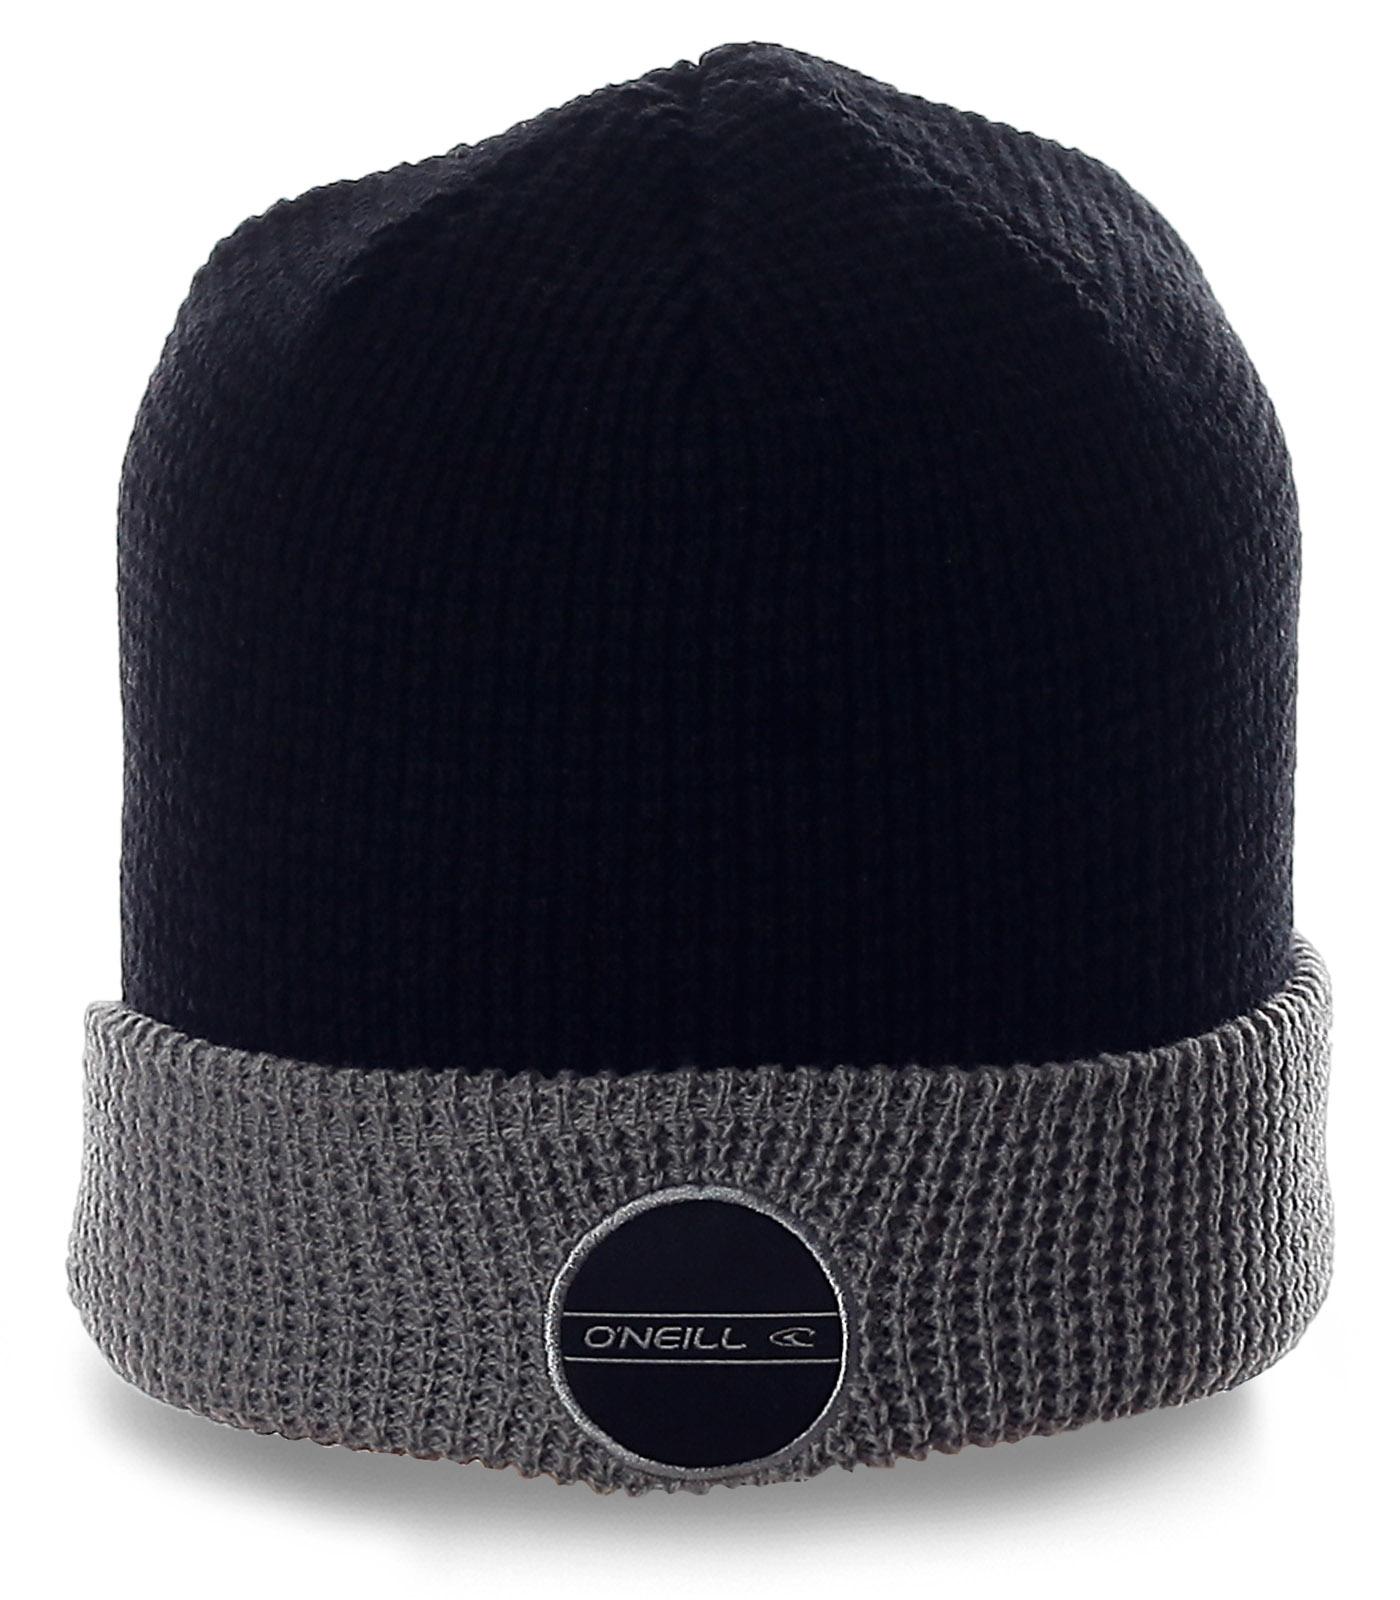 Мужские шапки O'Neill с доставкой